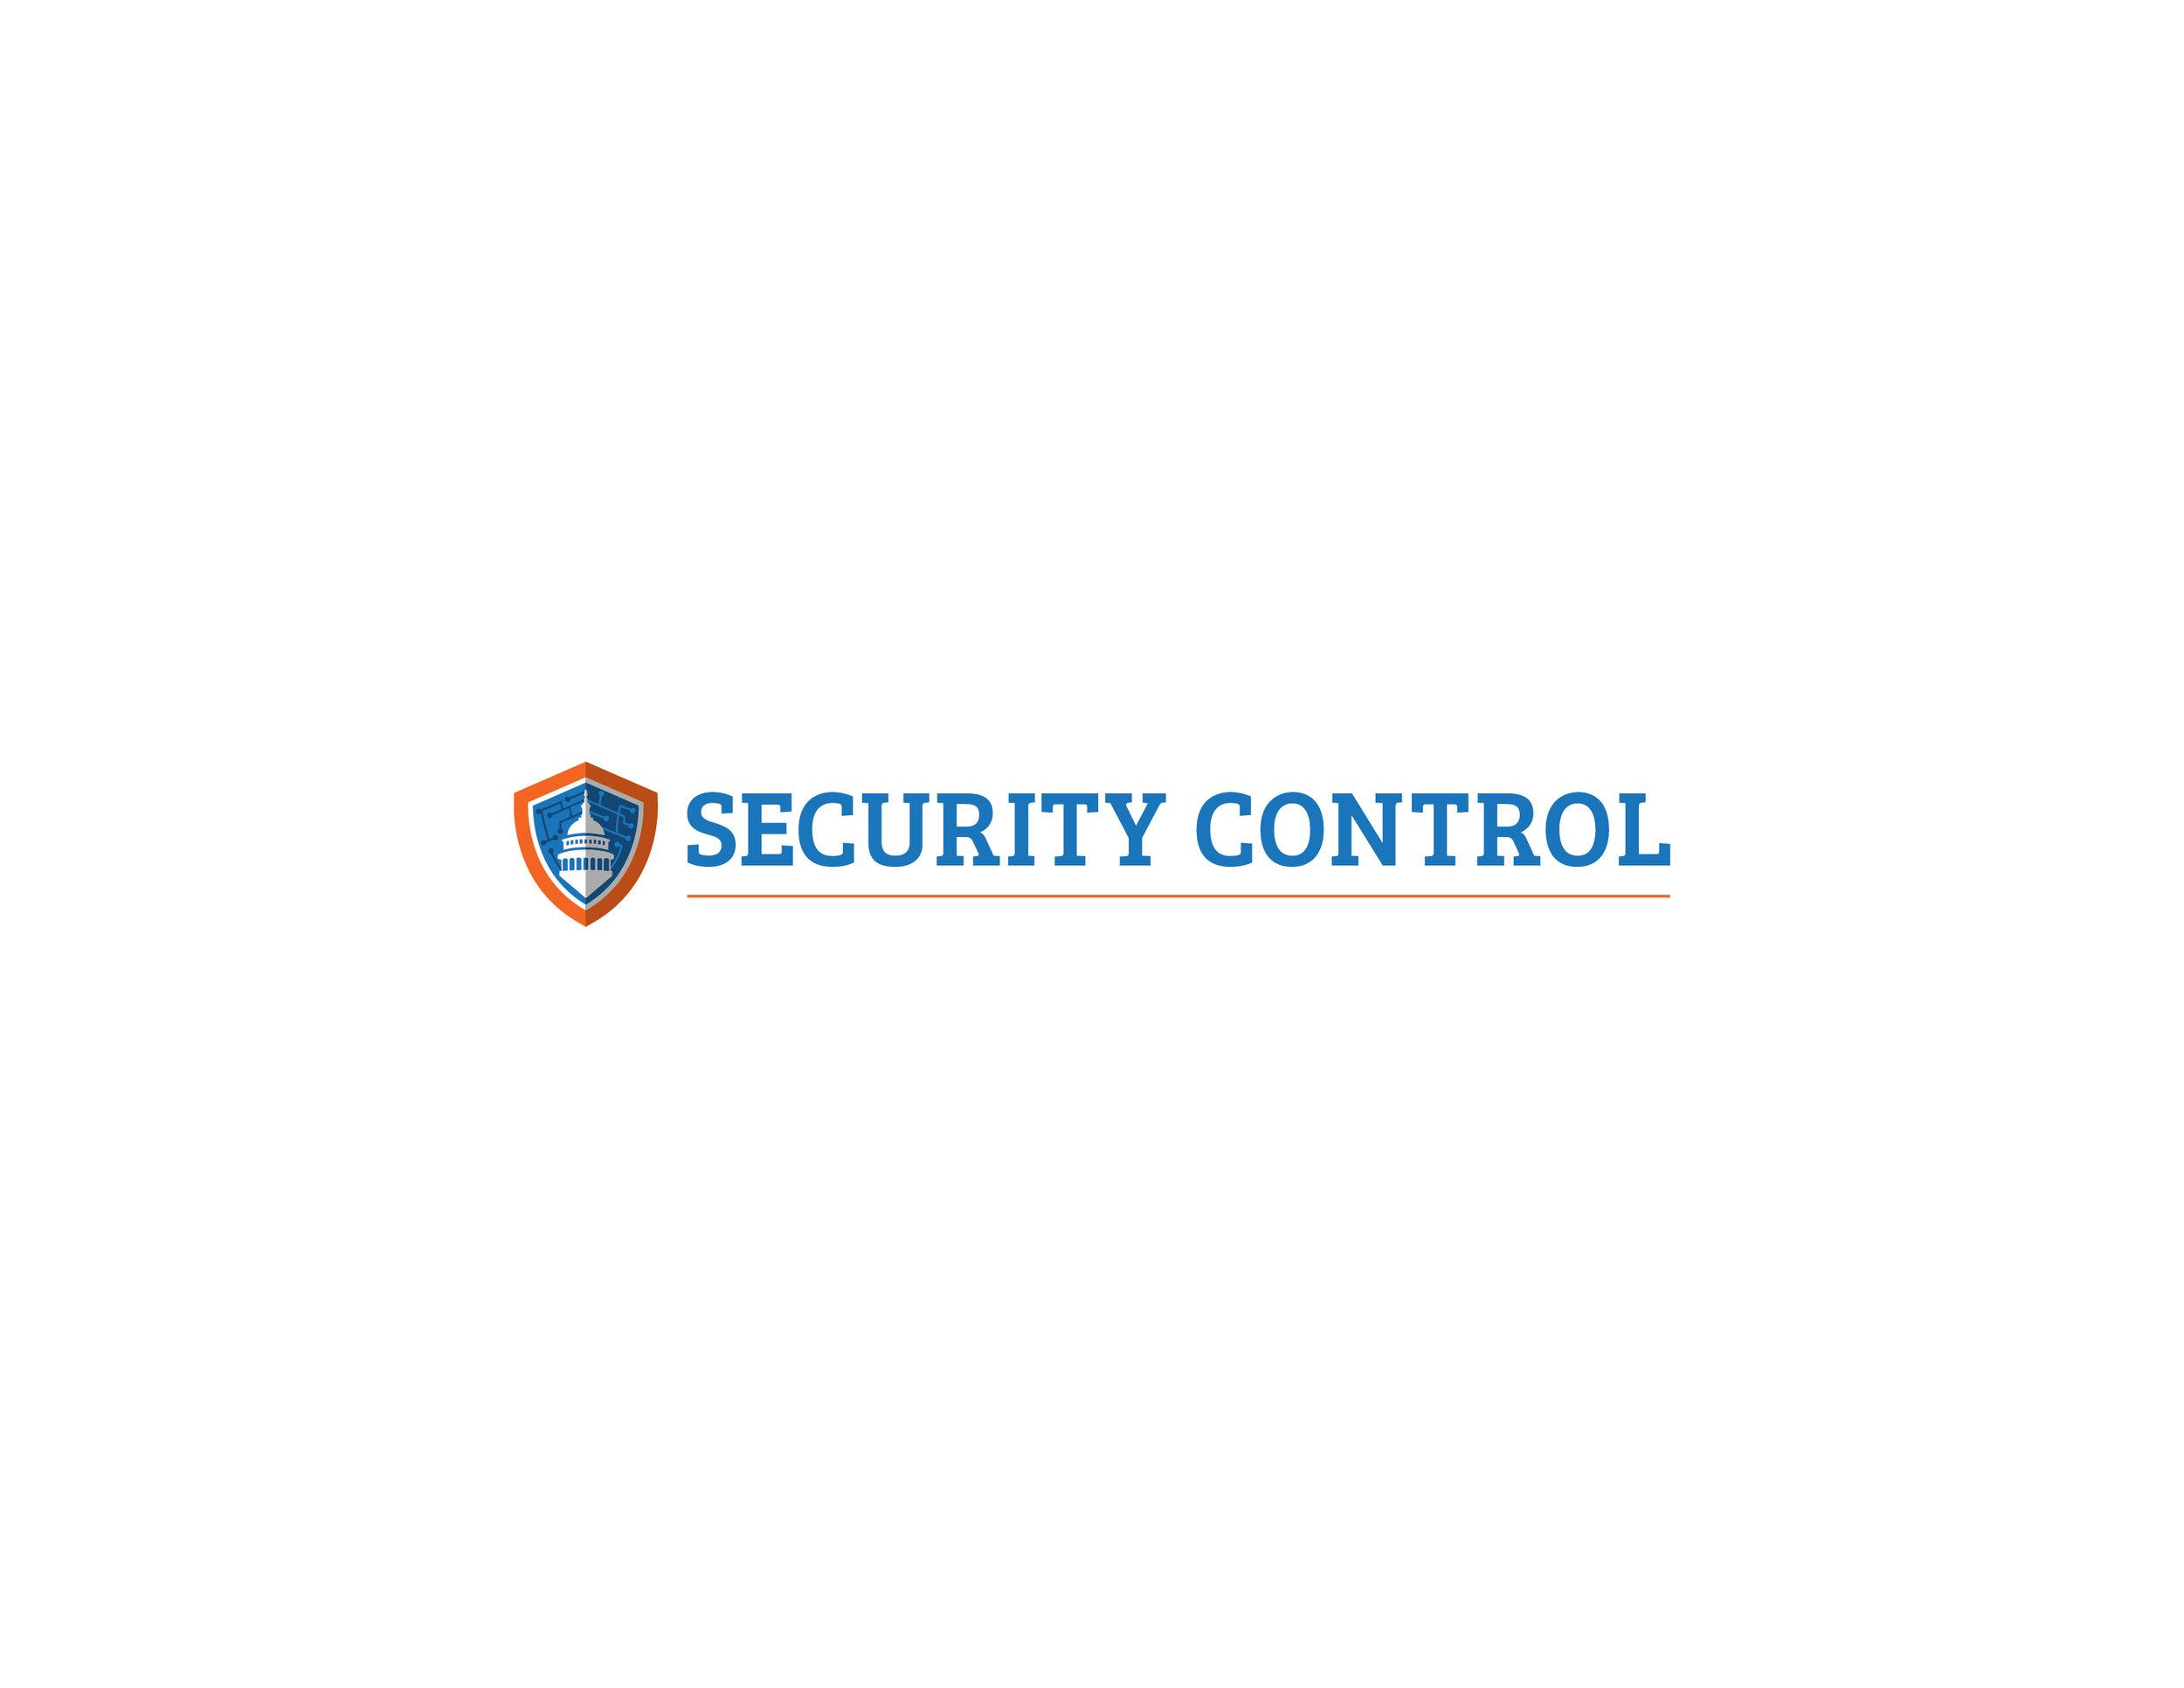 Security Control-Web-2.jpg